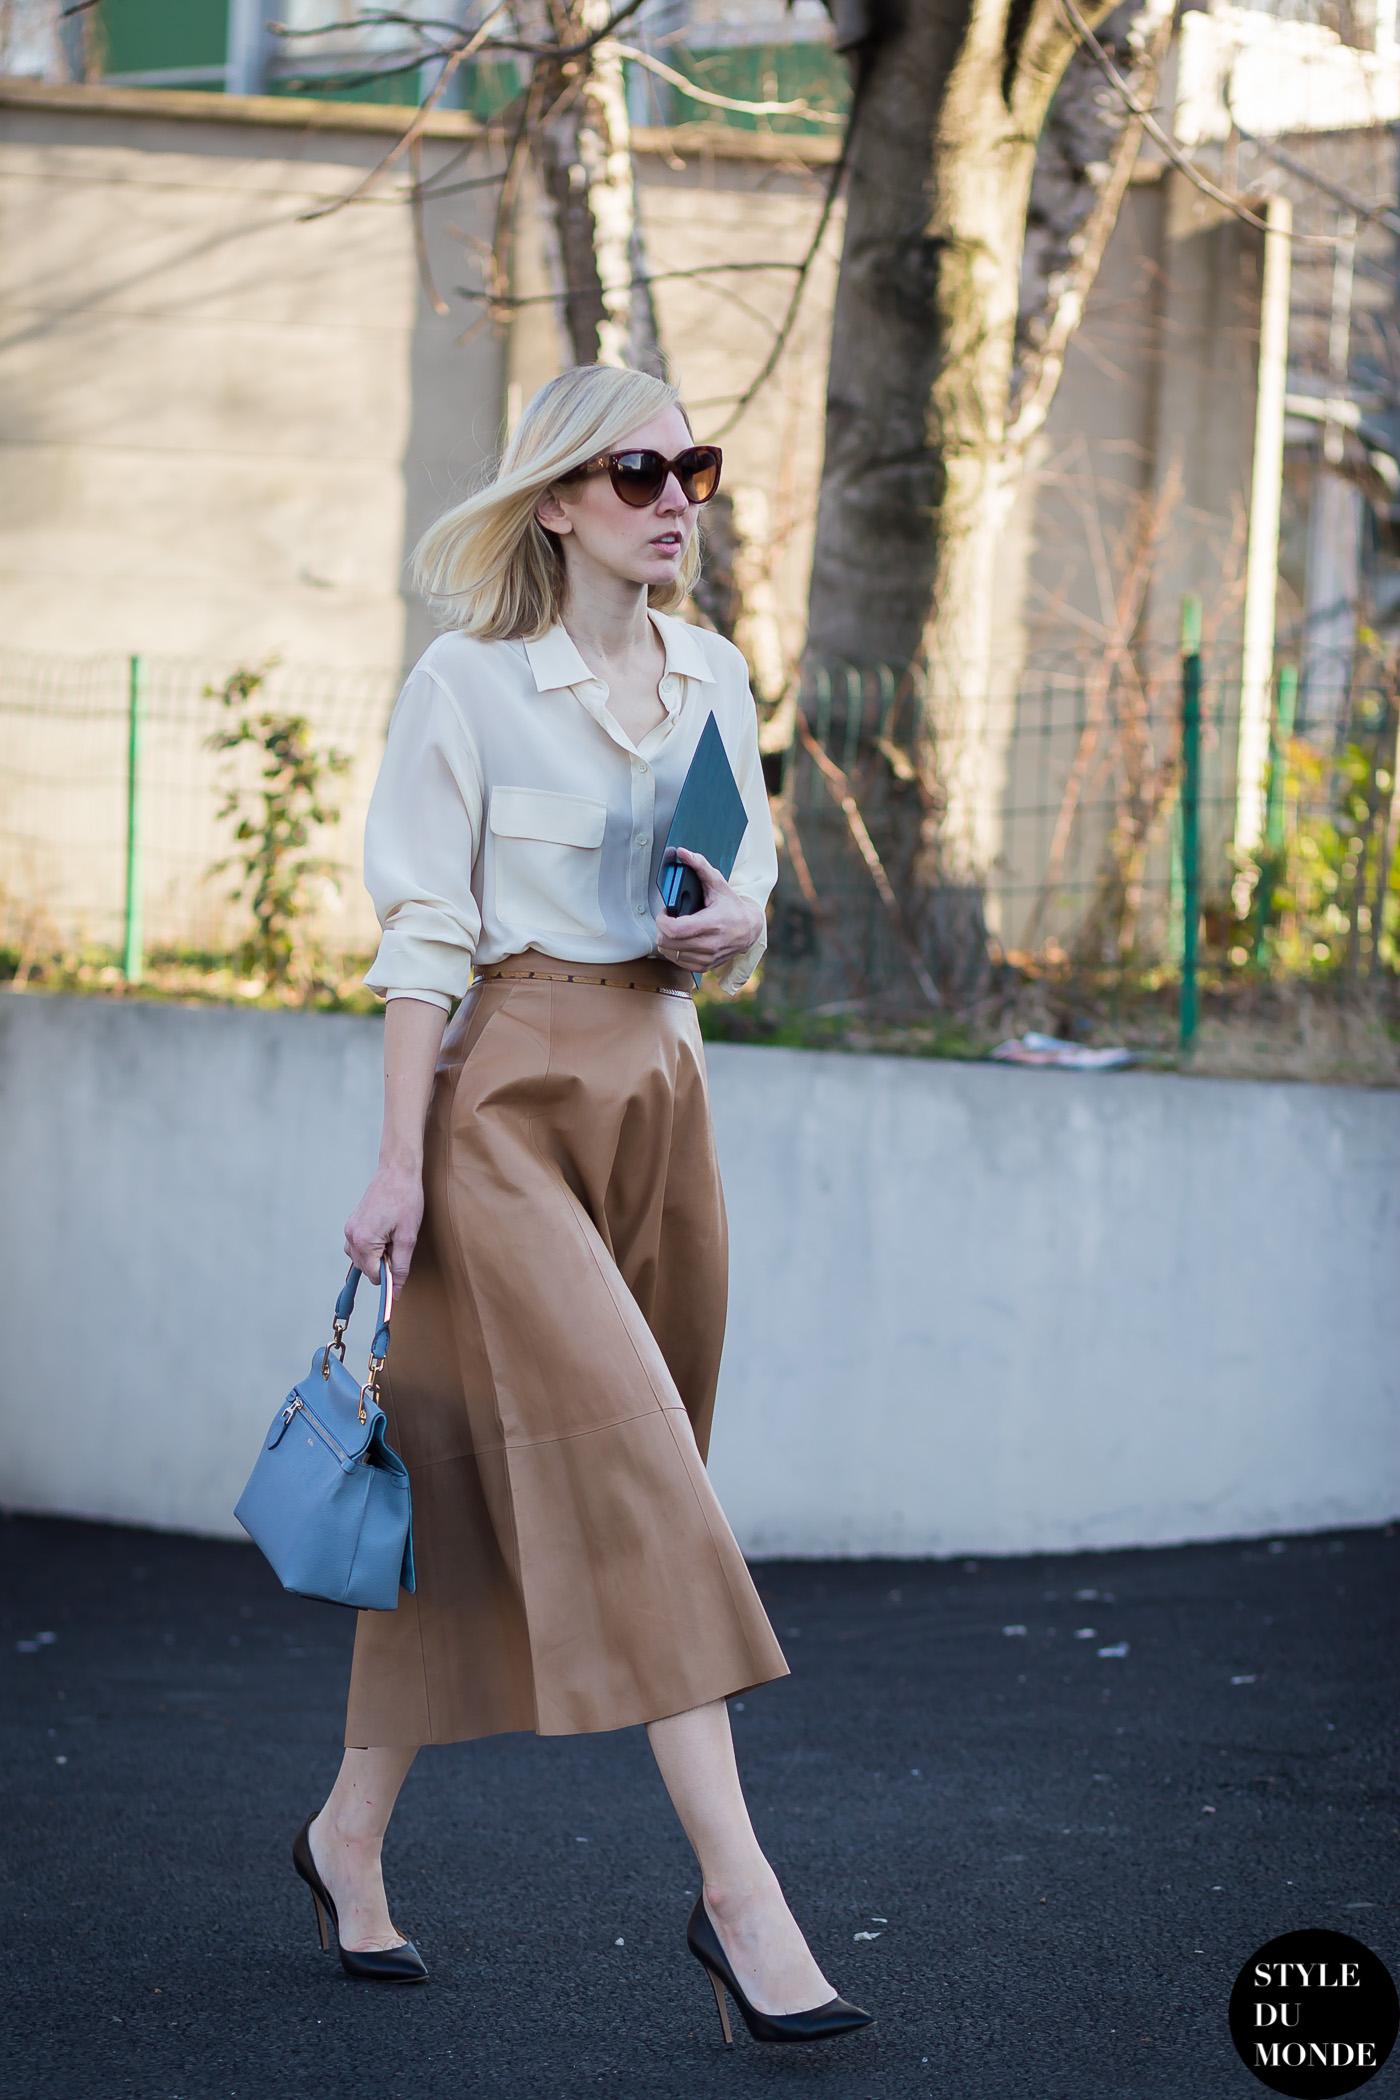 fd16d19ae4 Jane Keltner de Valle Street Style Street Fashion Streetsnaps by  STYLEDUMONDE Street Style Fashion Blog